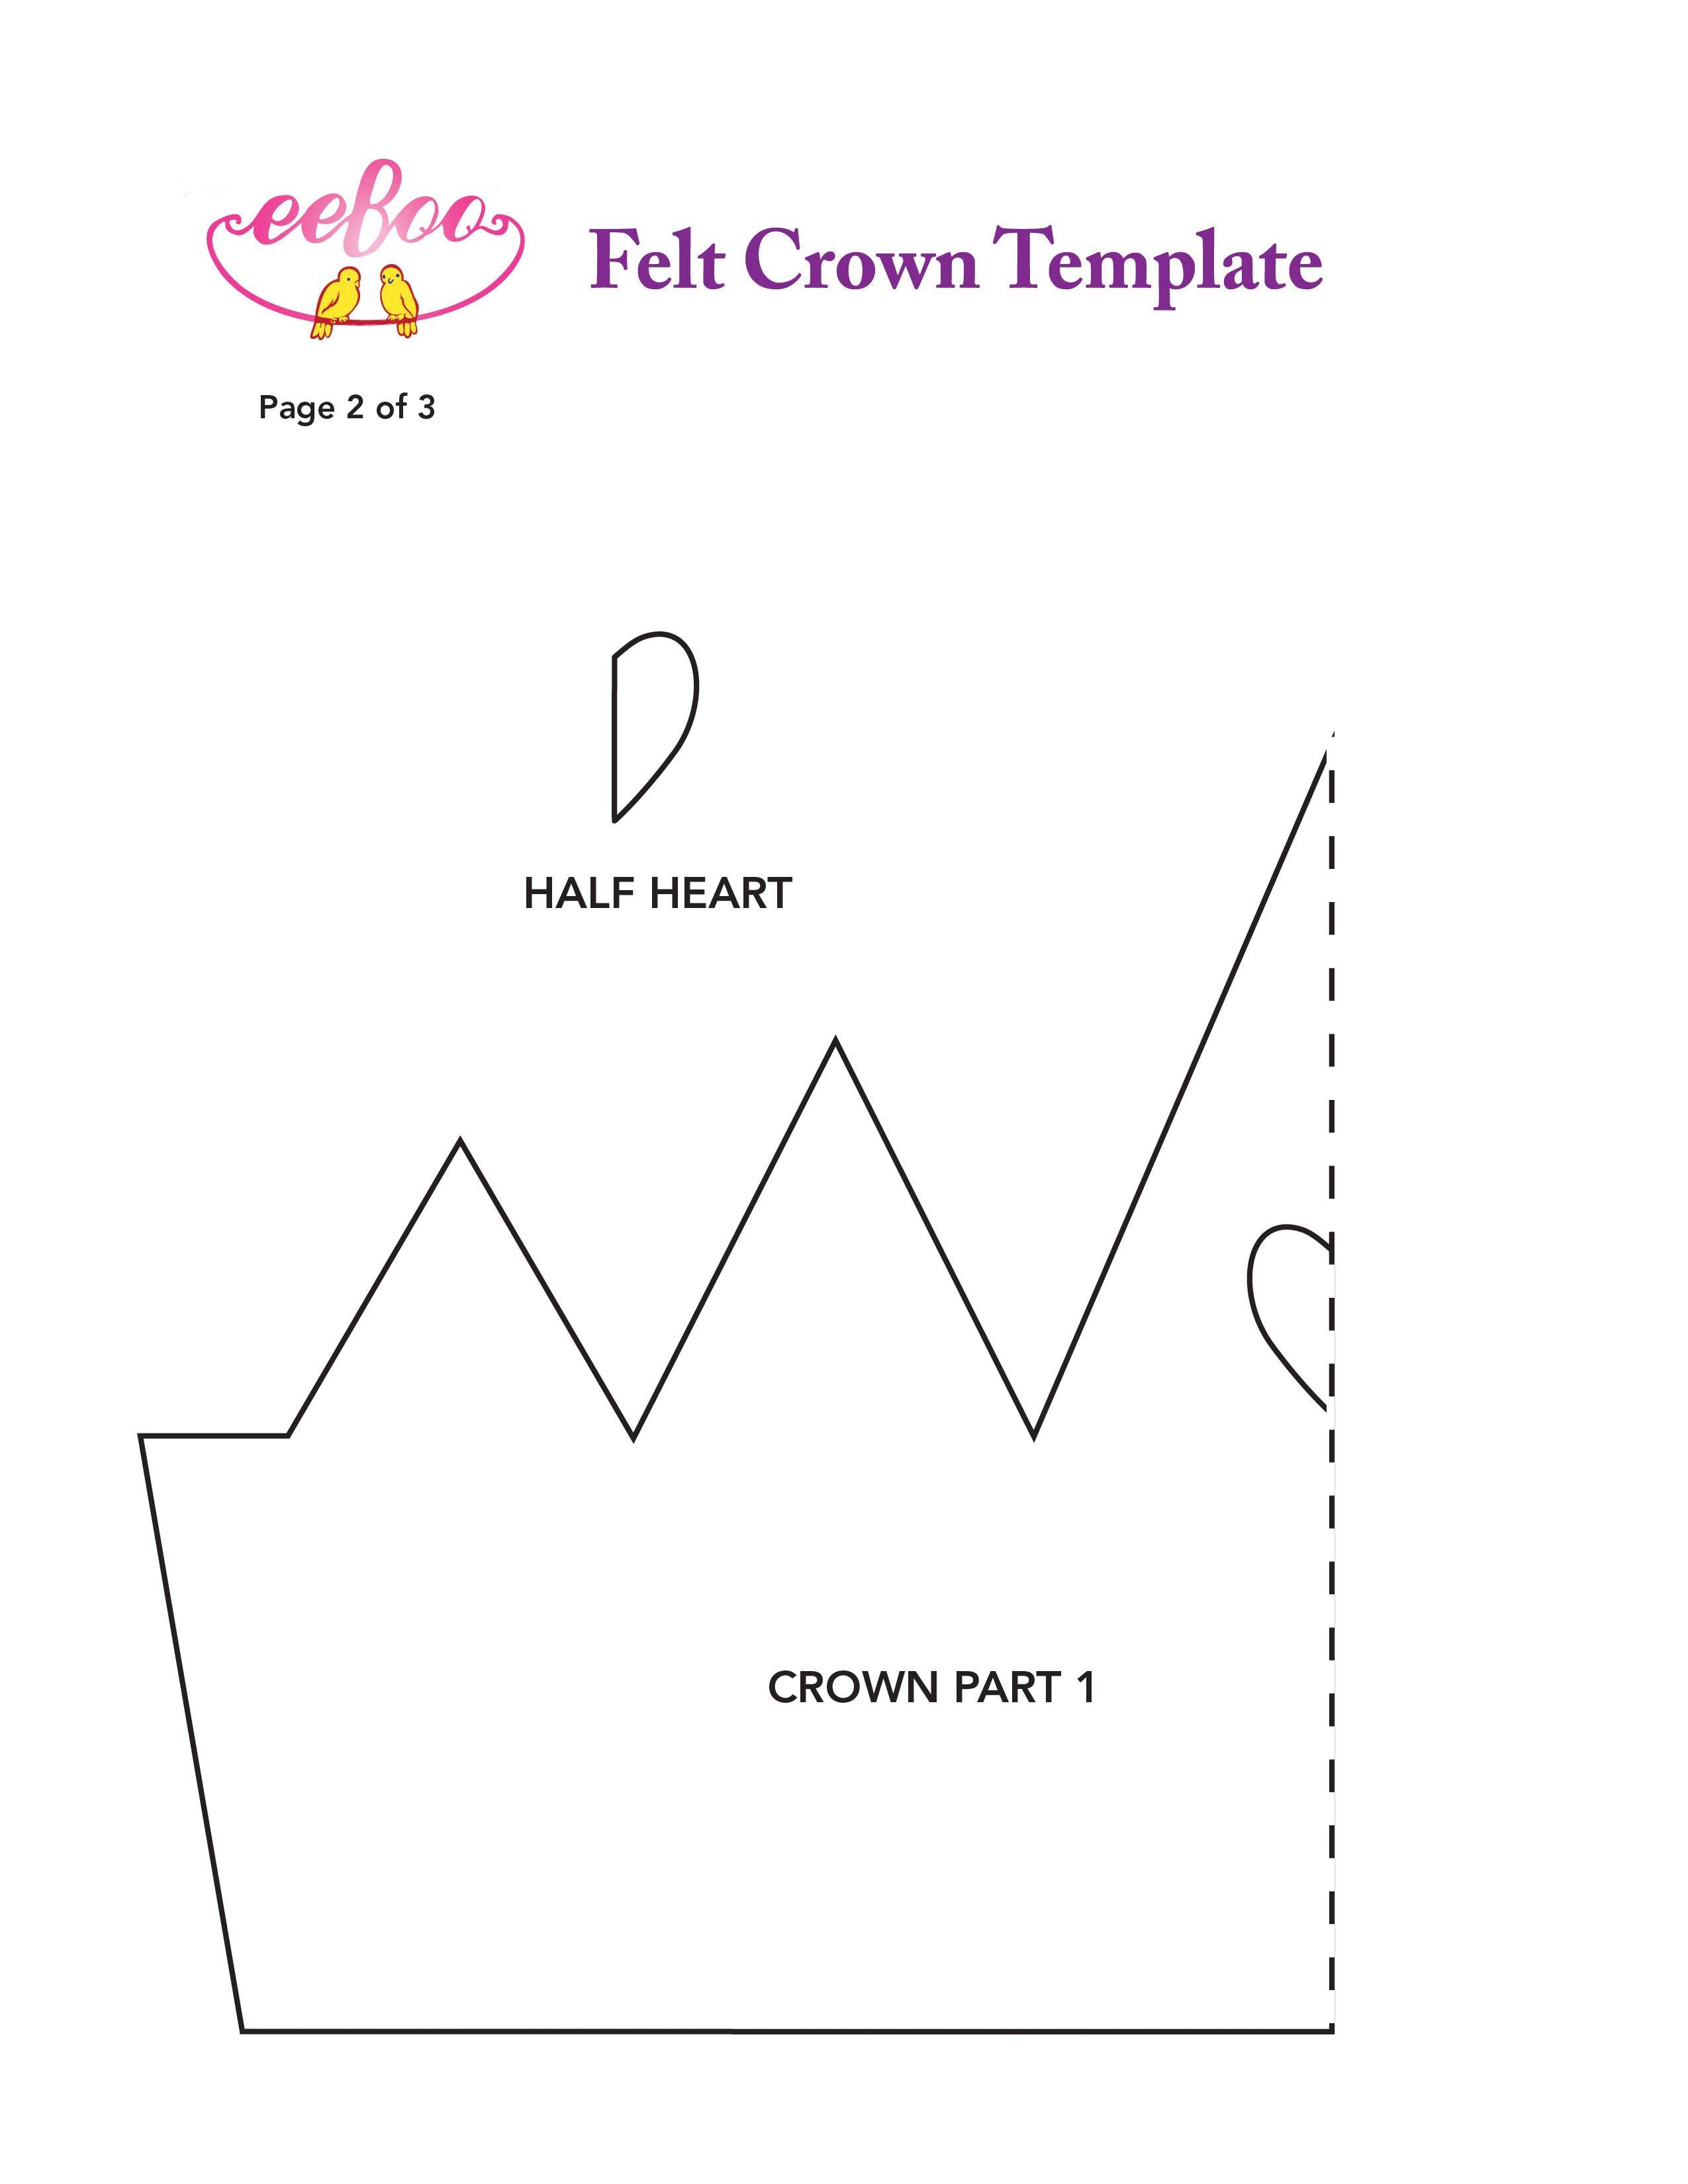 Queen Of Hearts Crown Template Eeboo Studio Blog Archive Mother's Day Crafts From Eeboo